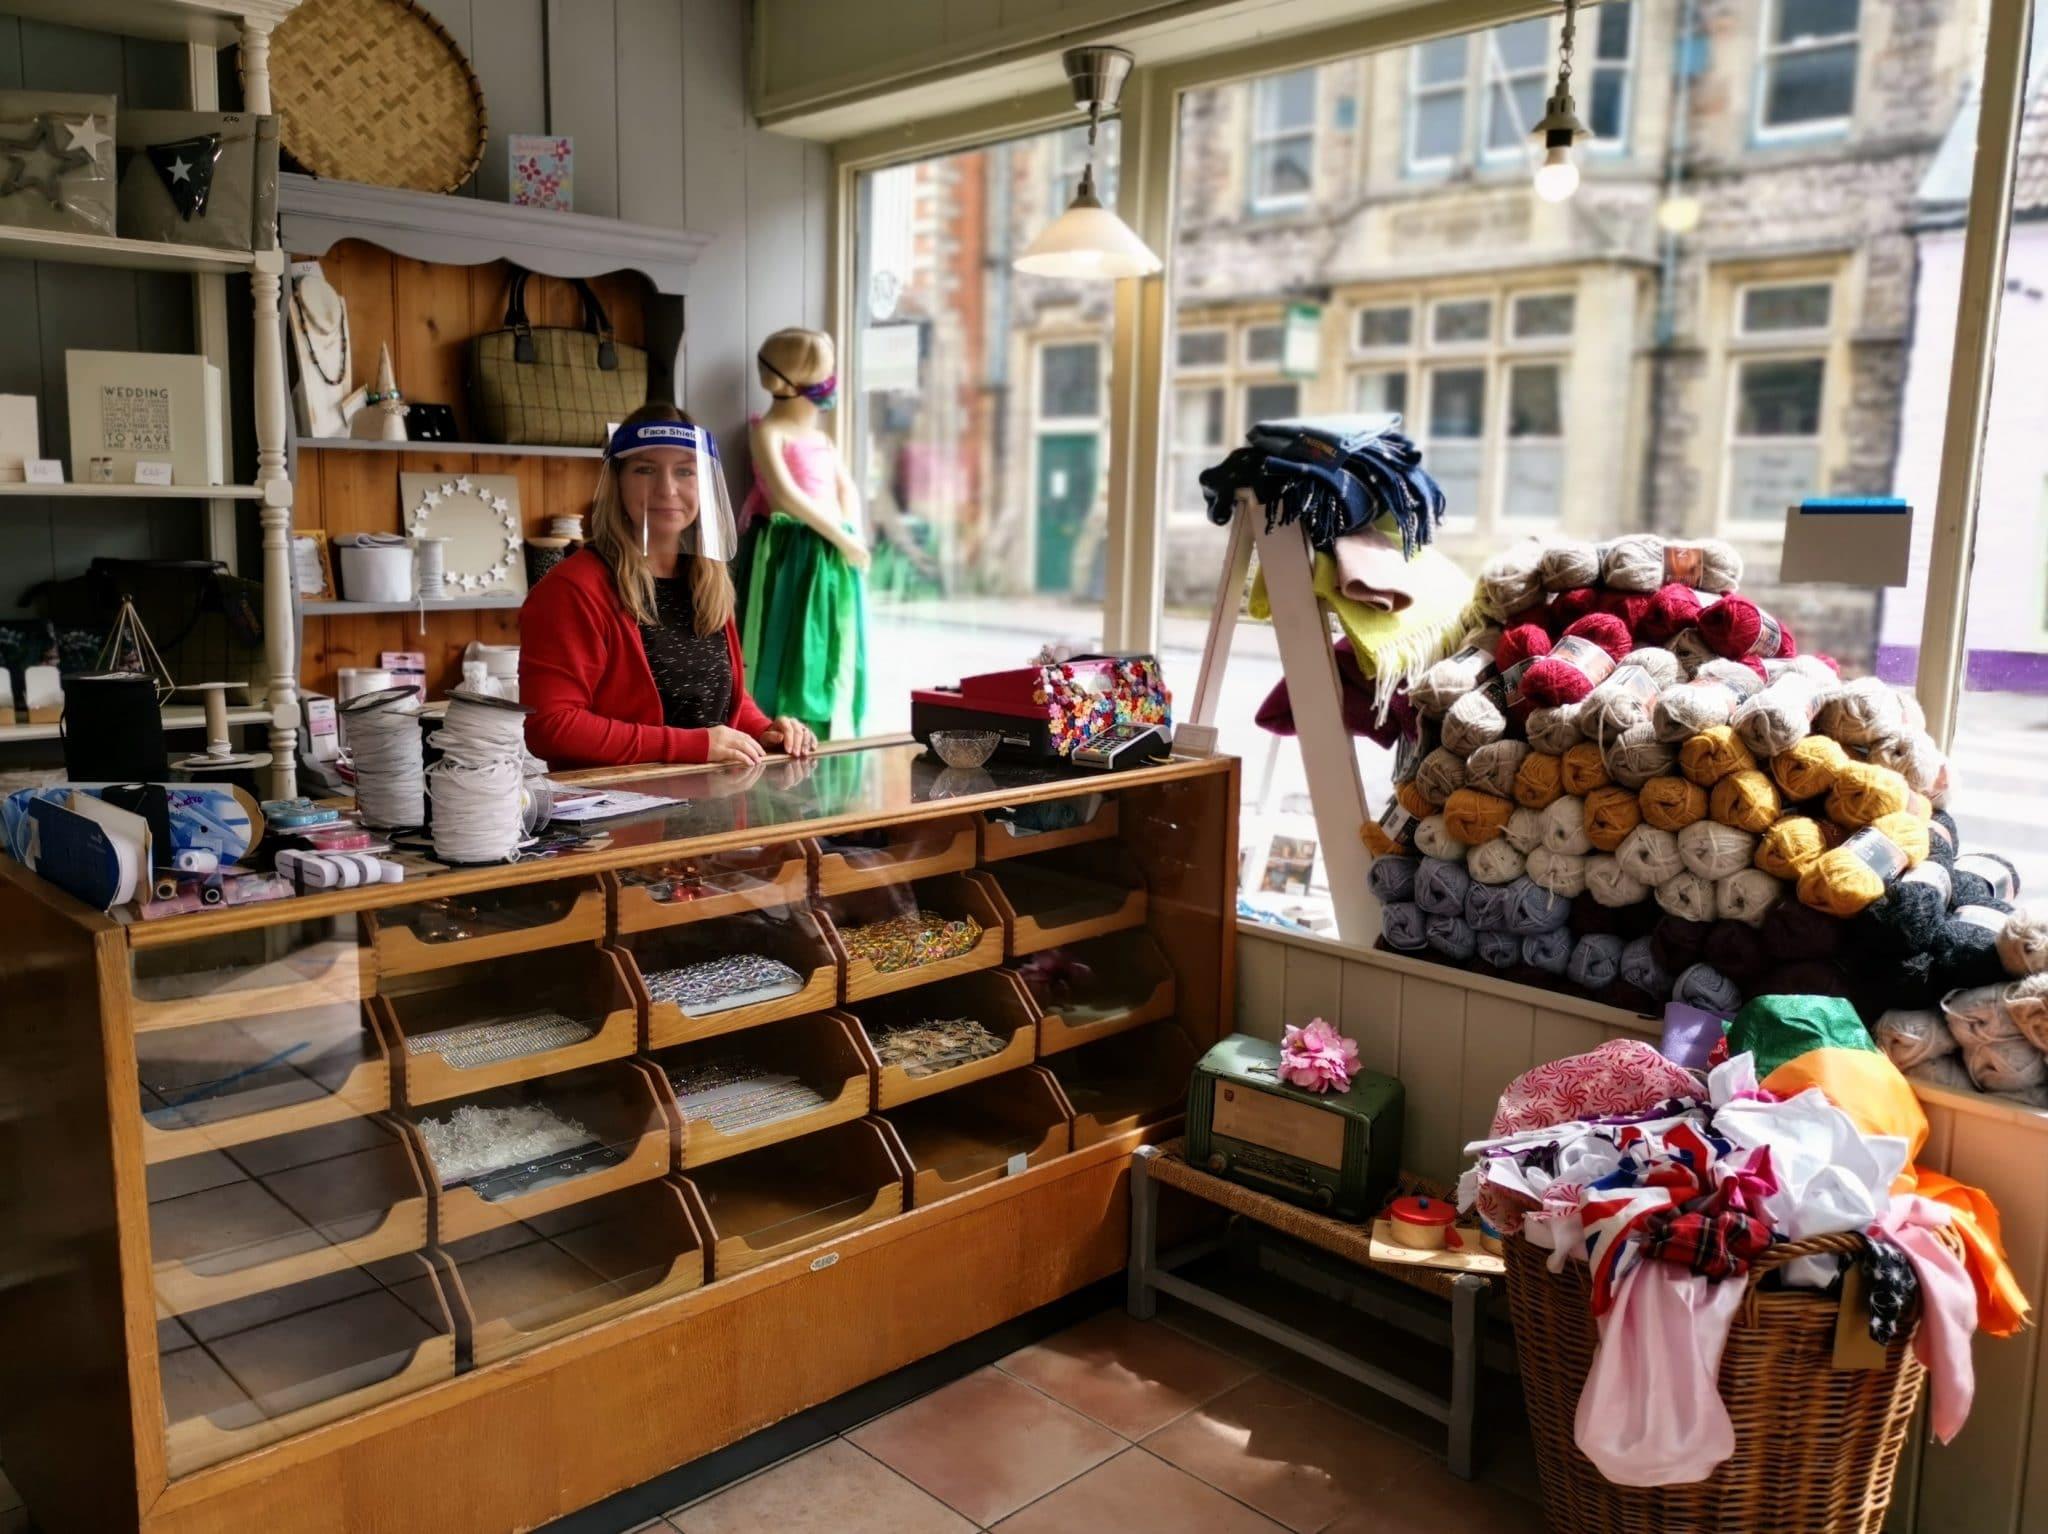 Sew Over the Moon Shop in Glastonbury